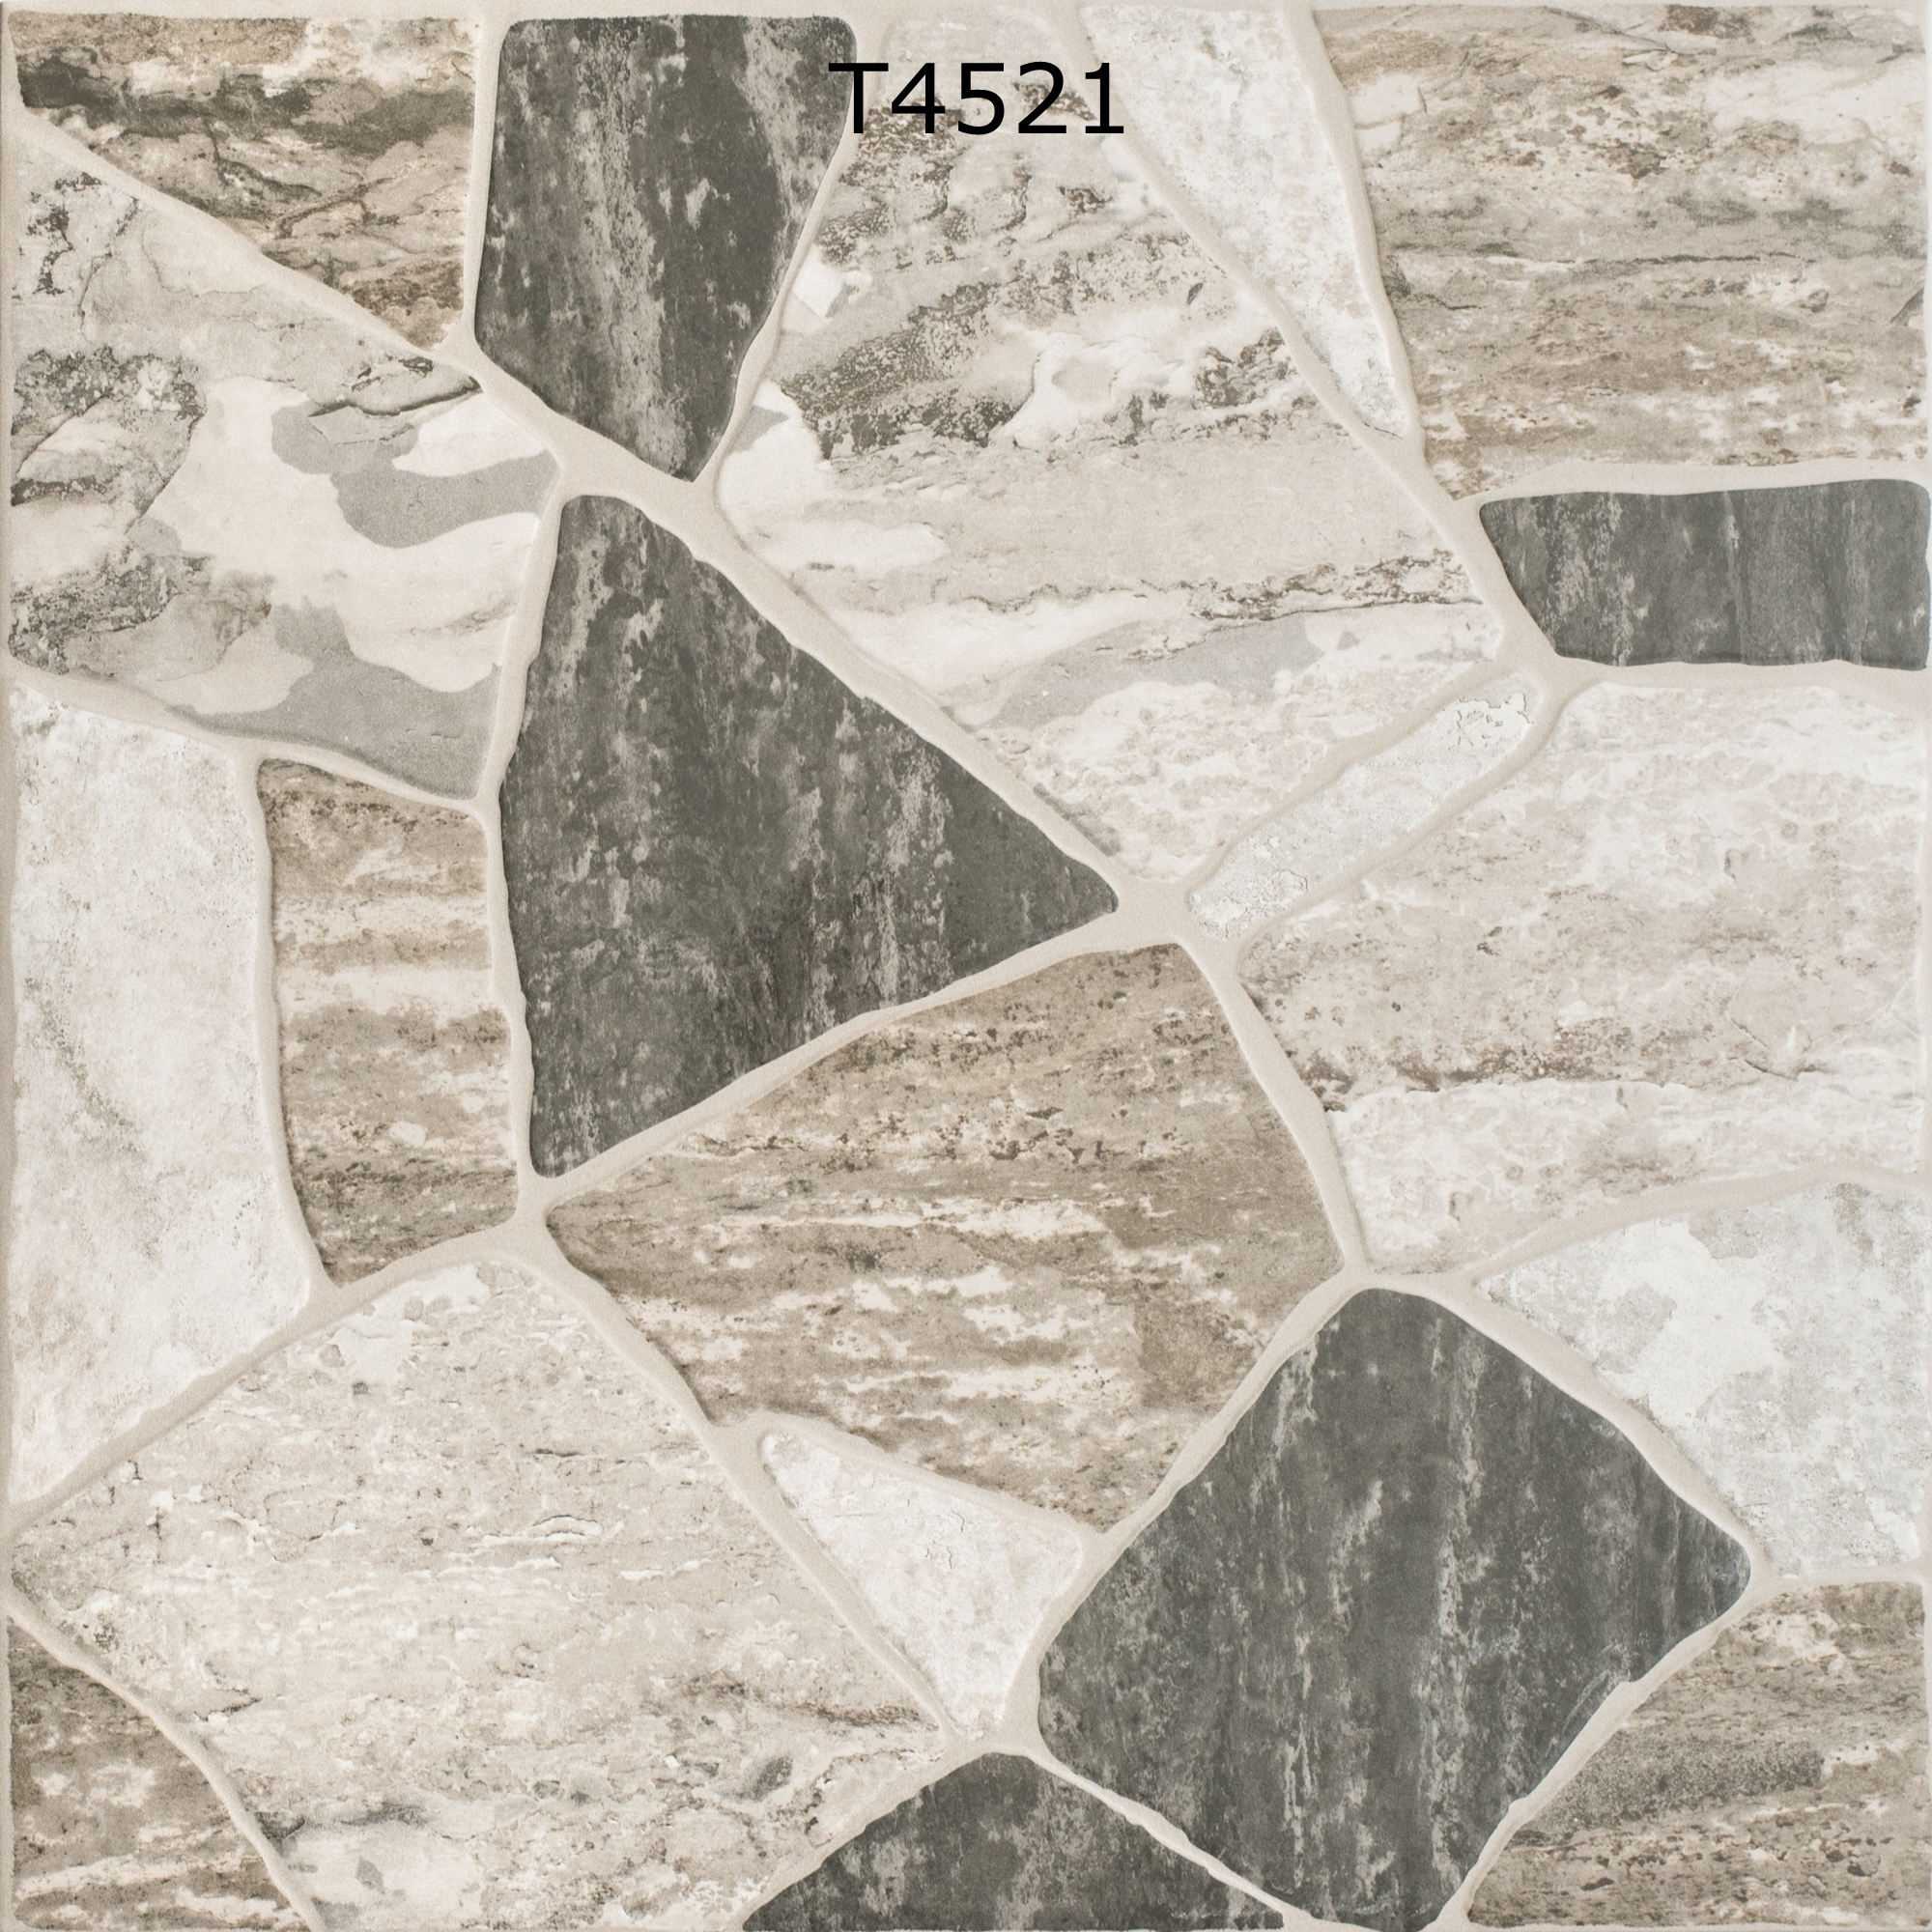 T4521